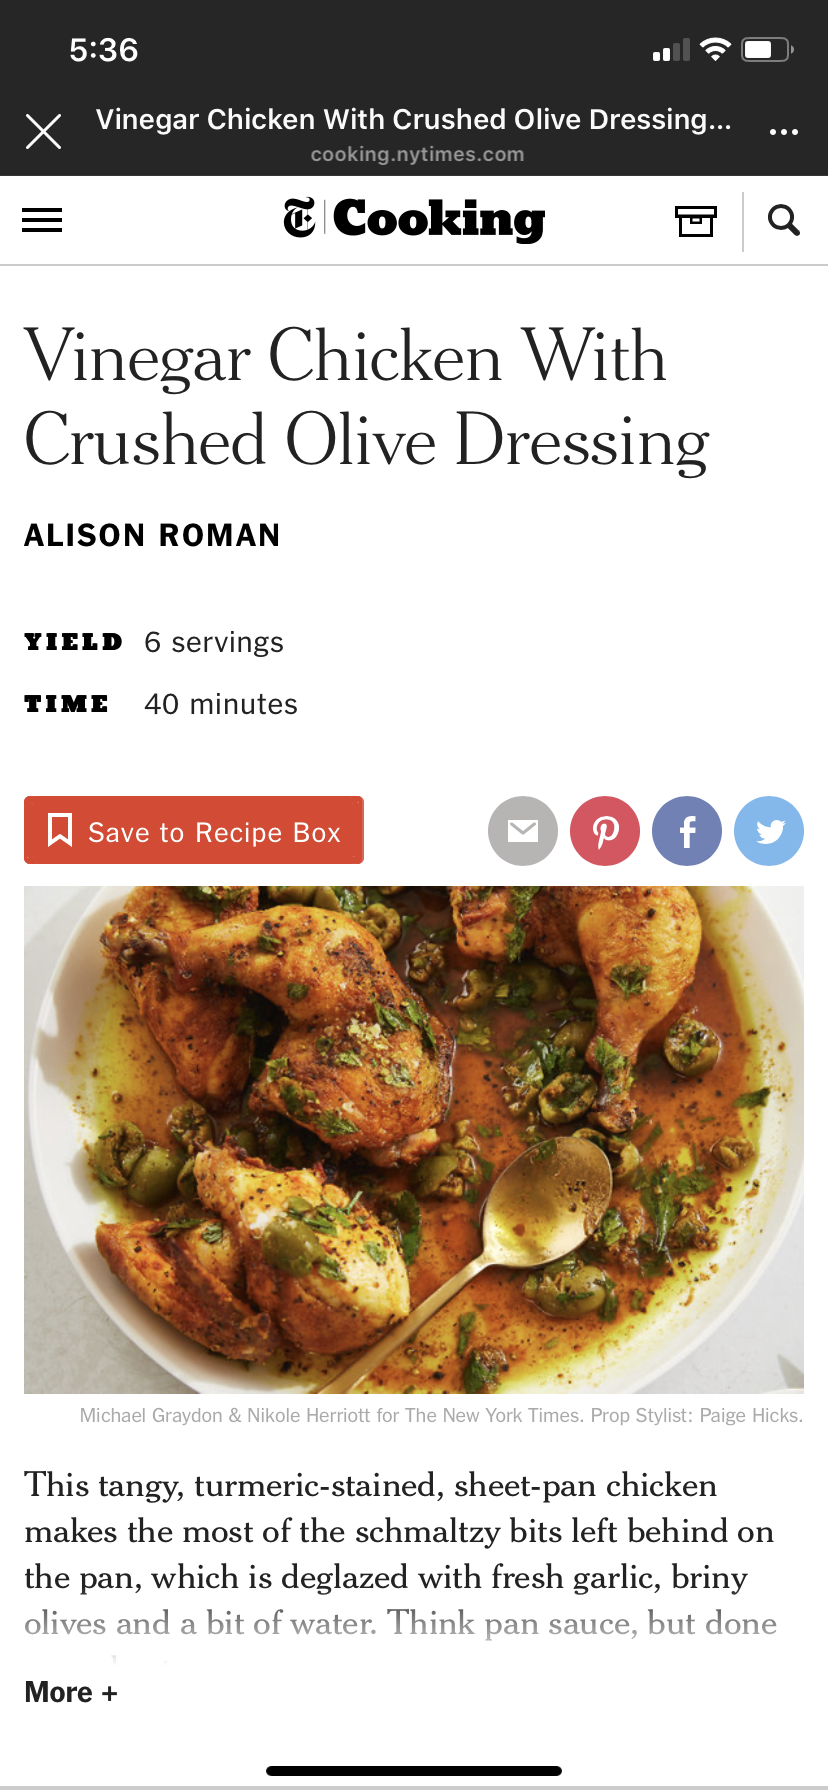 Bon Appetit Recipes Vinegar Chicken With Crushed Olive Dressing Bon Appetite Recipes Recipes Vinegar Chicken